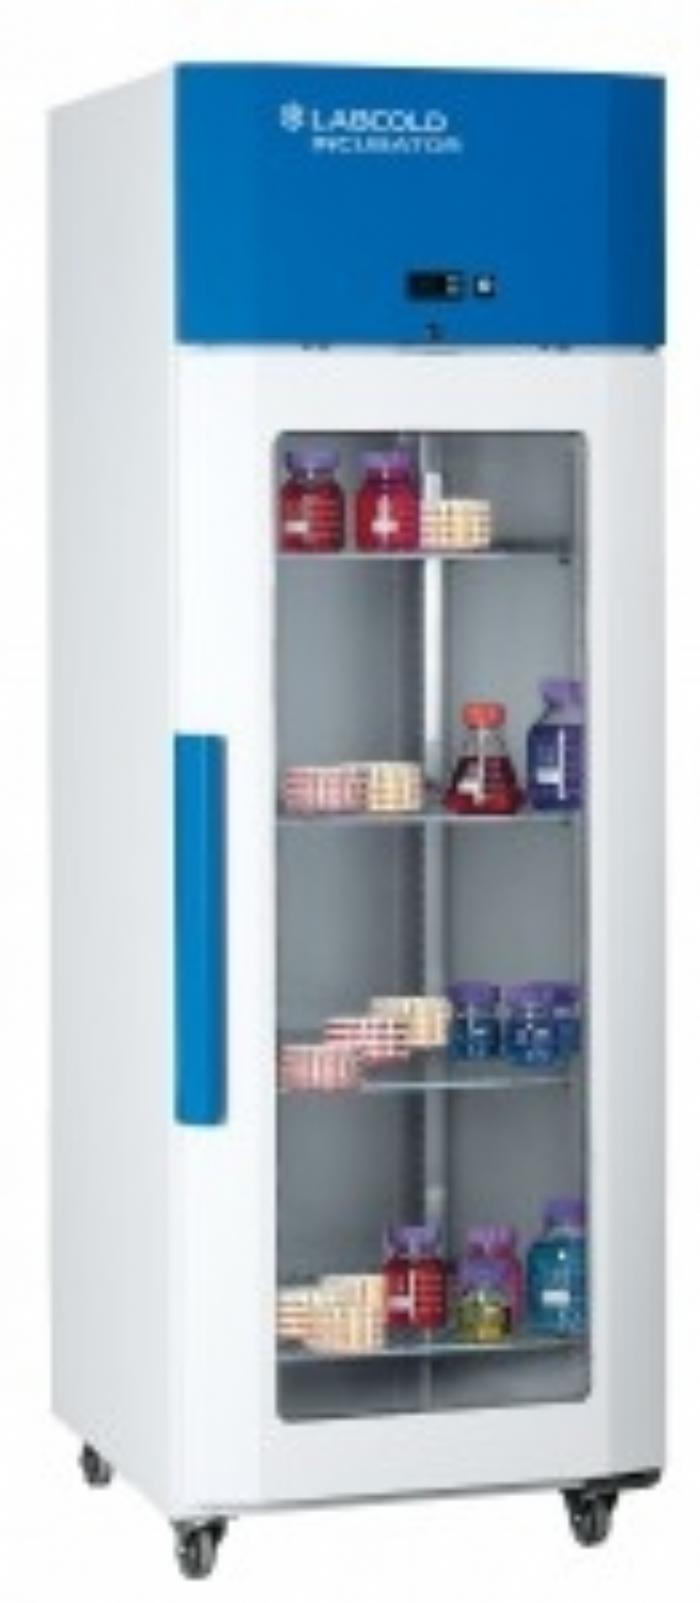 LabCold Cooled Incubator Glass Door 570L RLCG0600